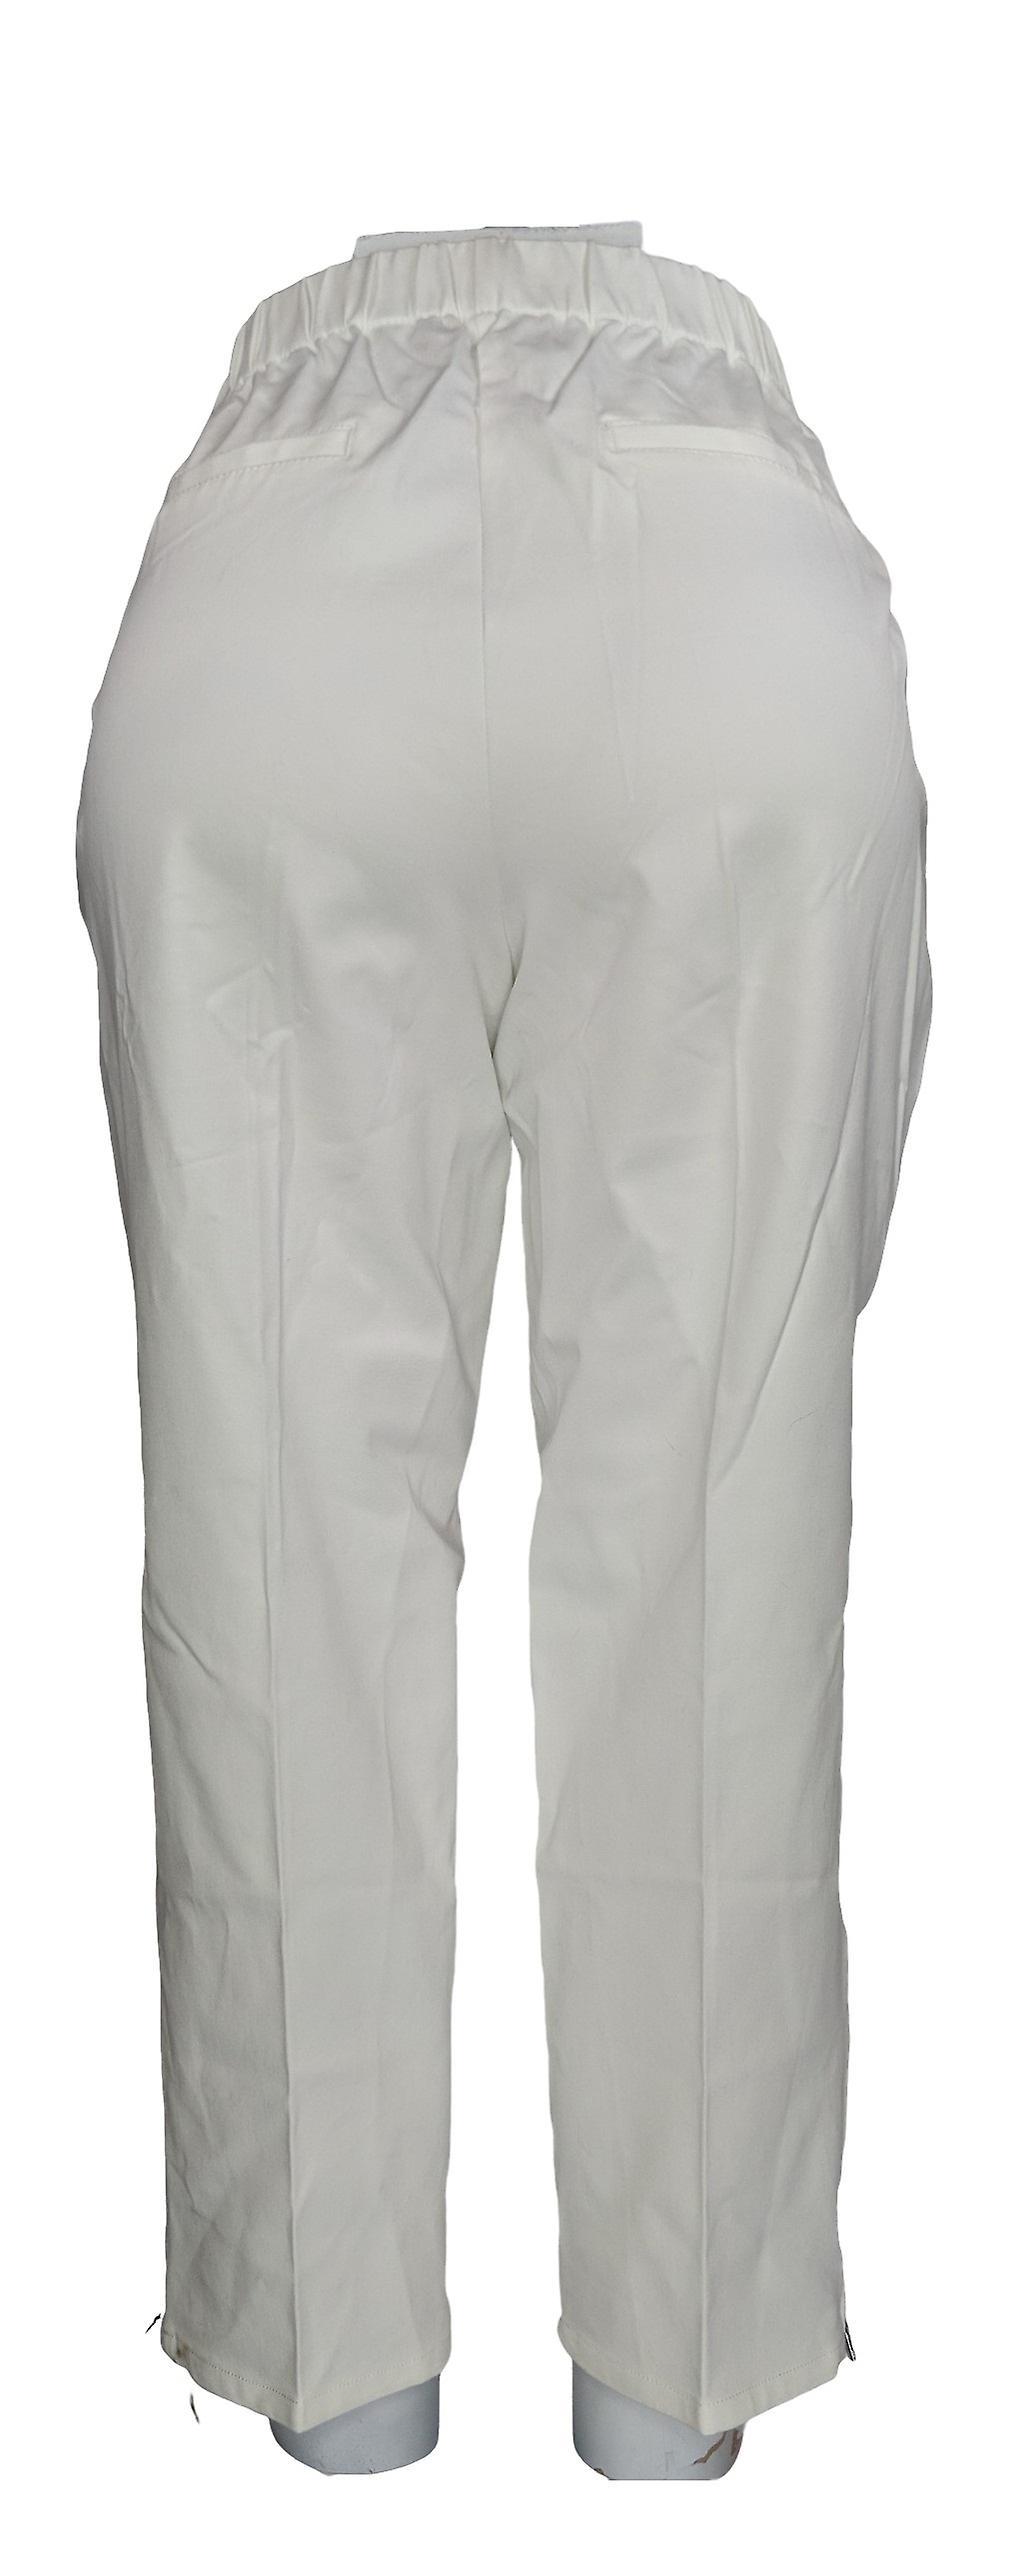 Isaac Mizrahi Live! Women's Petite Pants 24/7 Stretch Ankle White A286113 rLmGux